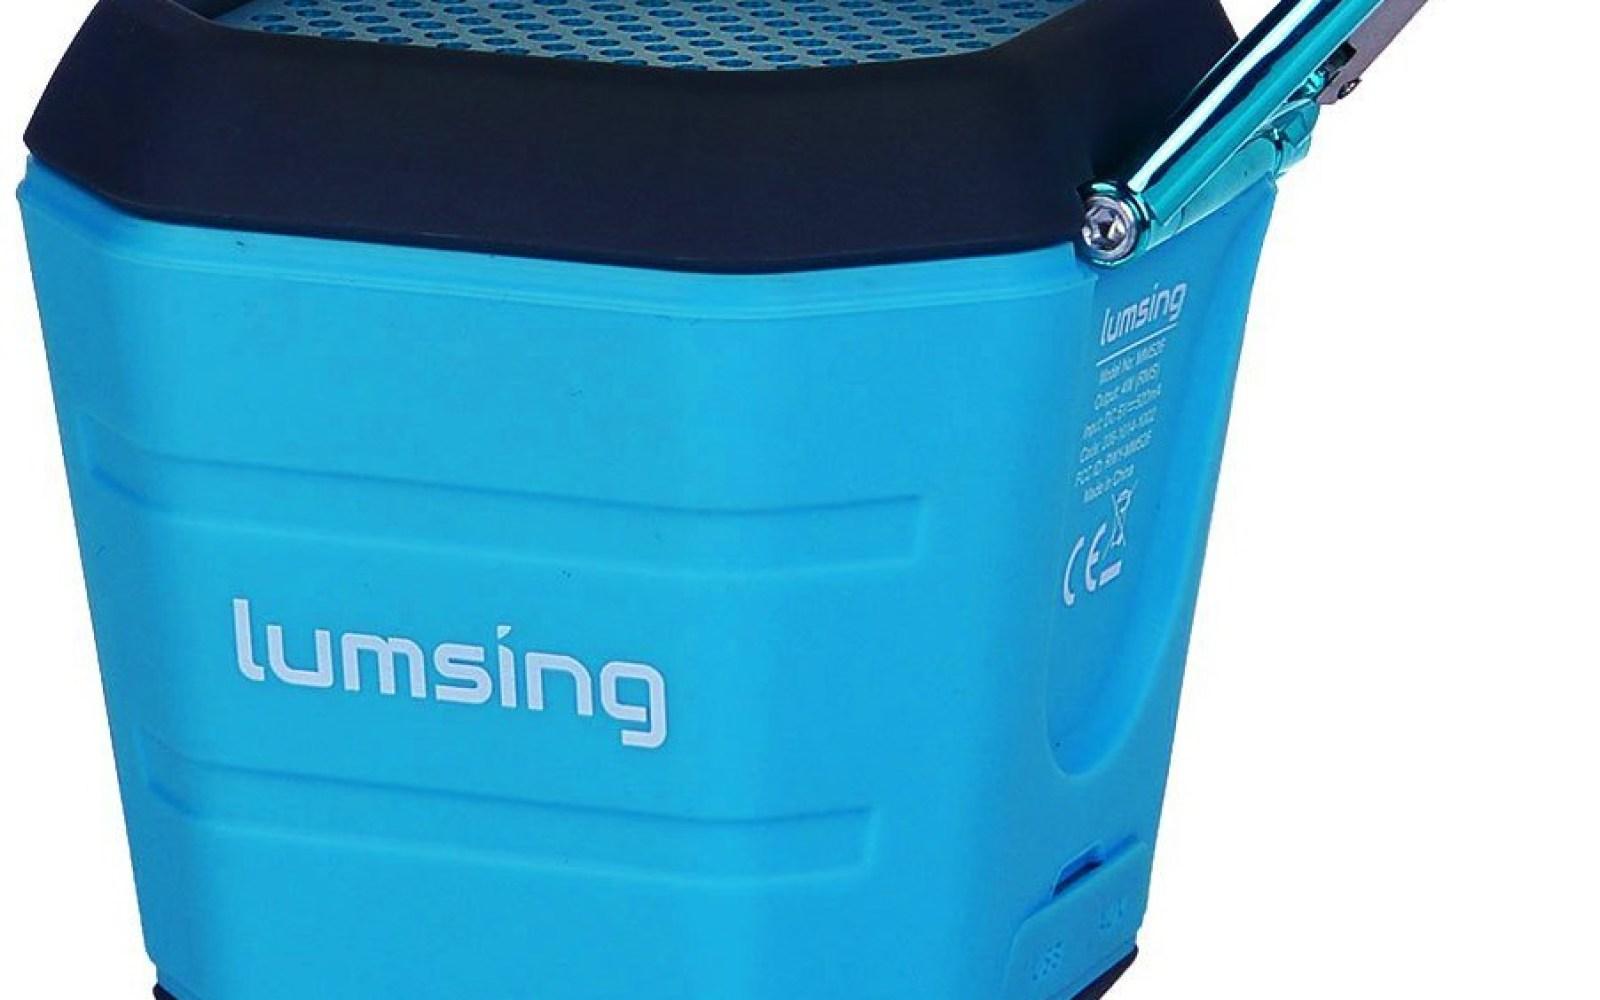 Lumsing Portable Waterproof Bluetooth 4.0 Speaker $29 Prime shipped (Reg. $70)